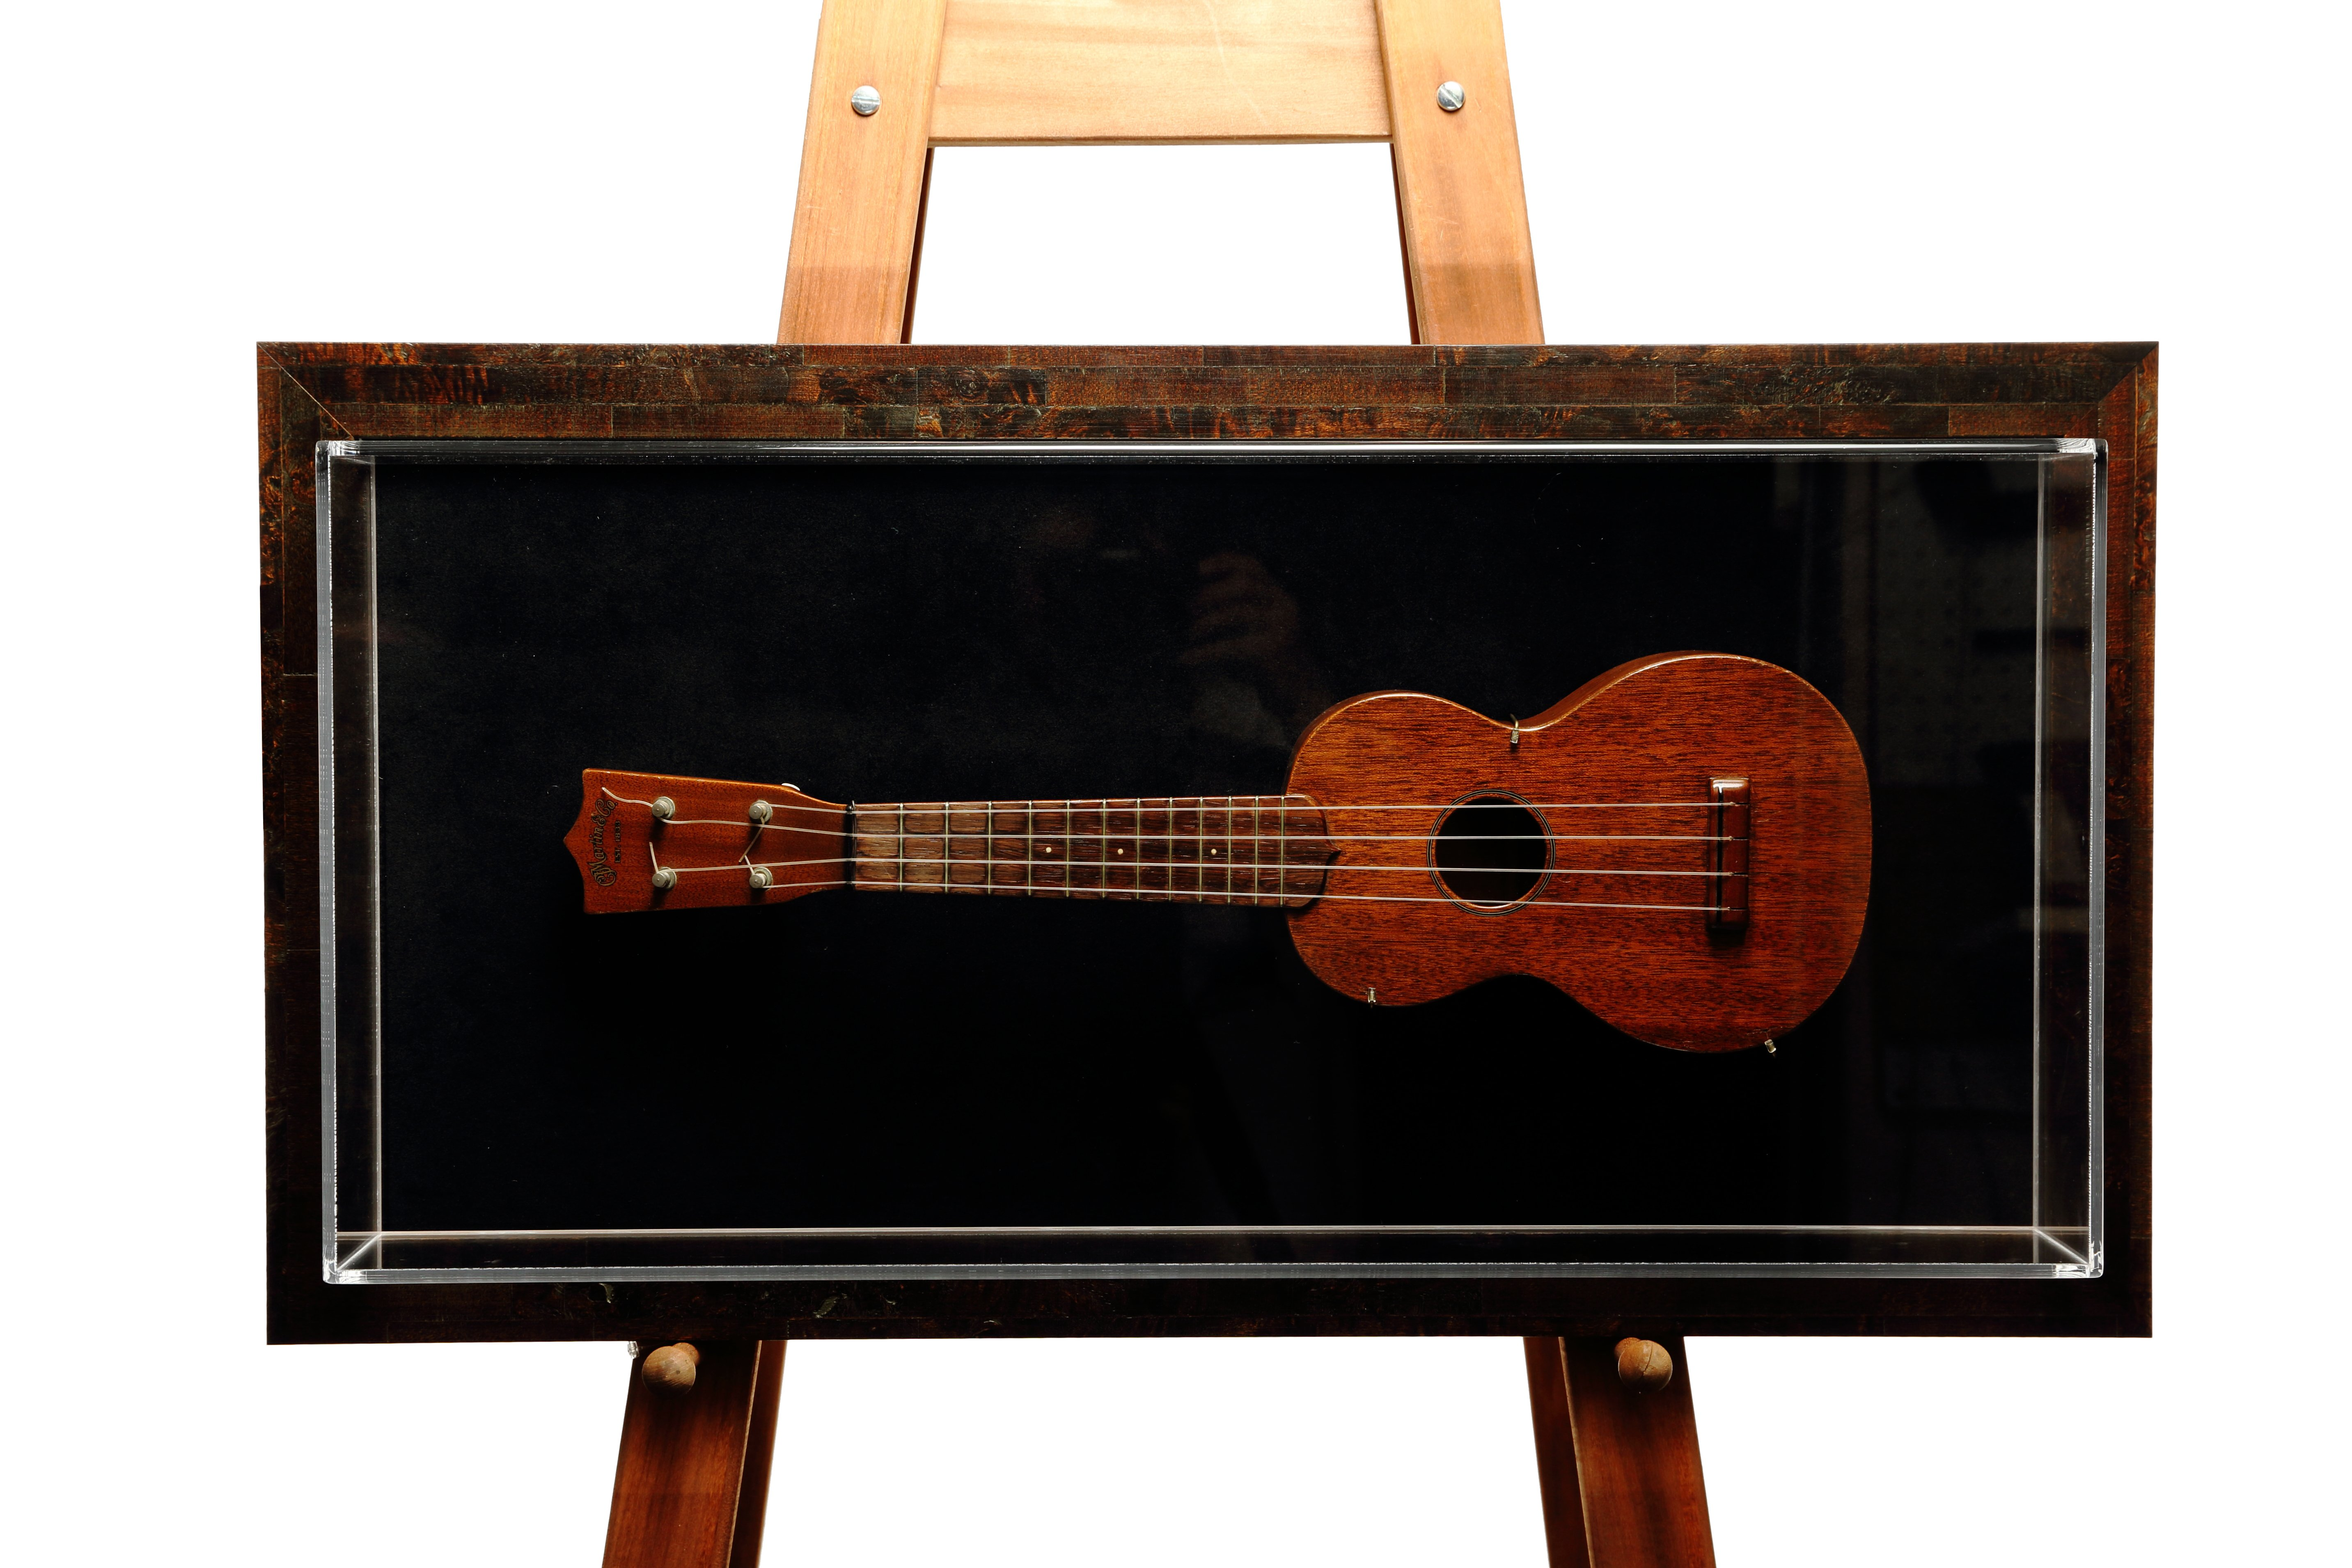 custom bases & acrylic boxes - Houston TX - My Workshop Custom Picture Framing